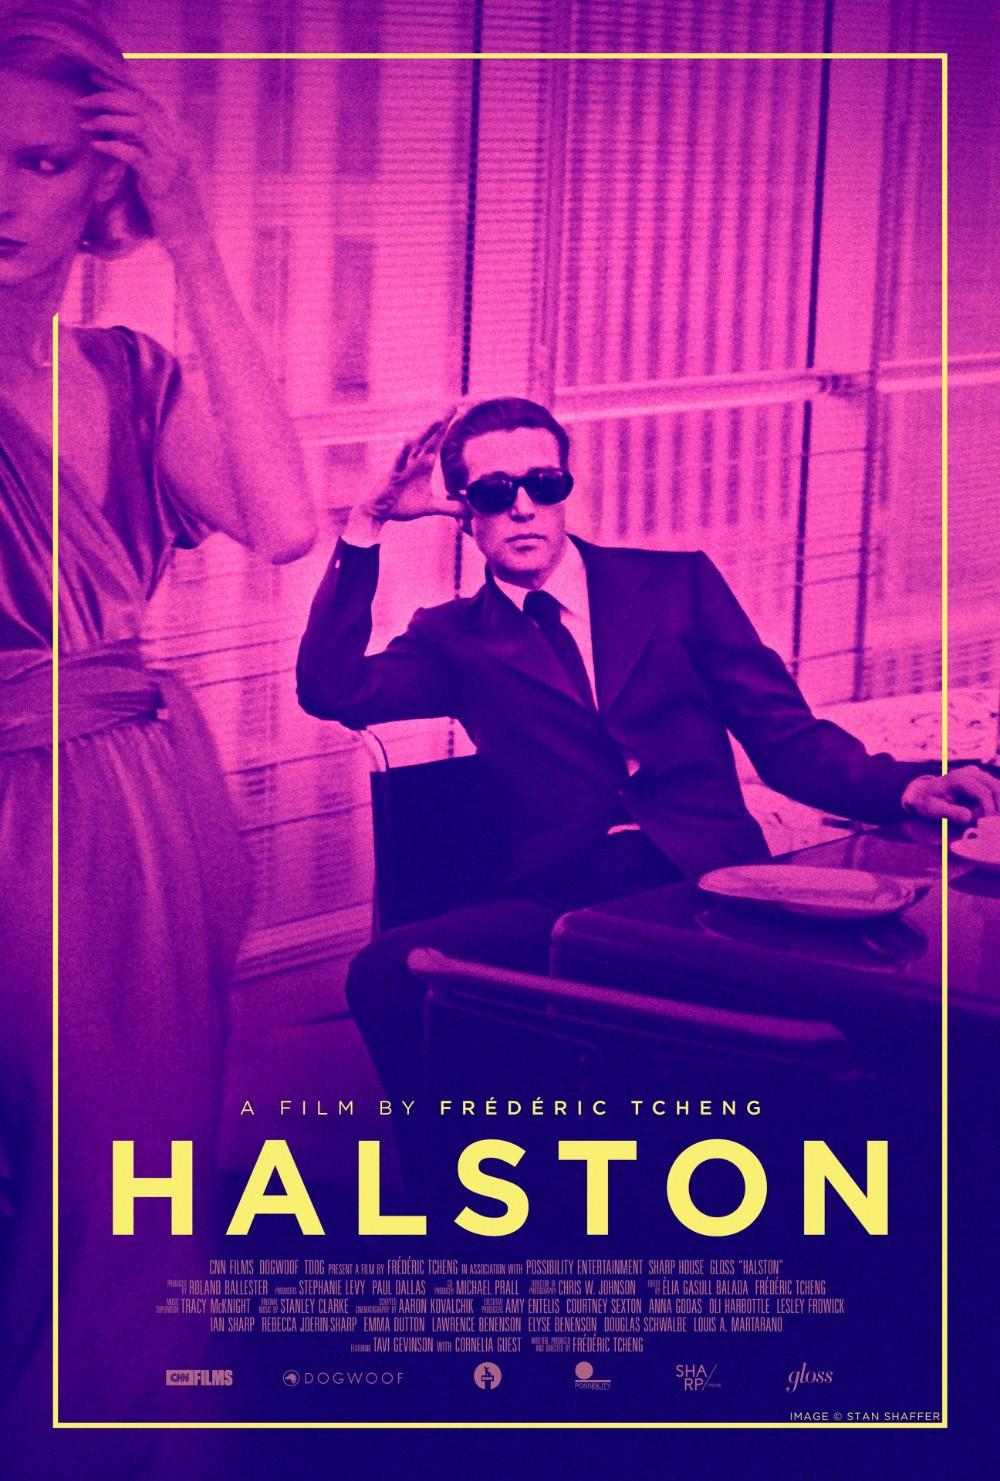 HALSTON – HIGH RES JPEG (1)